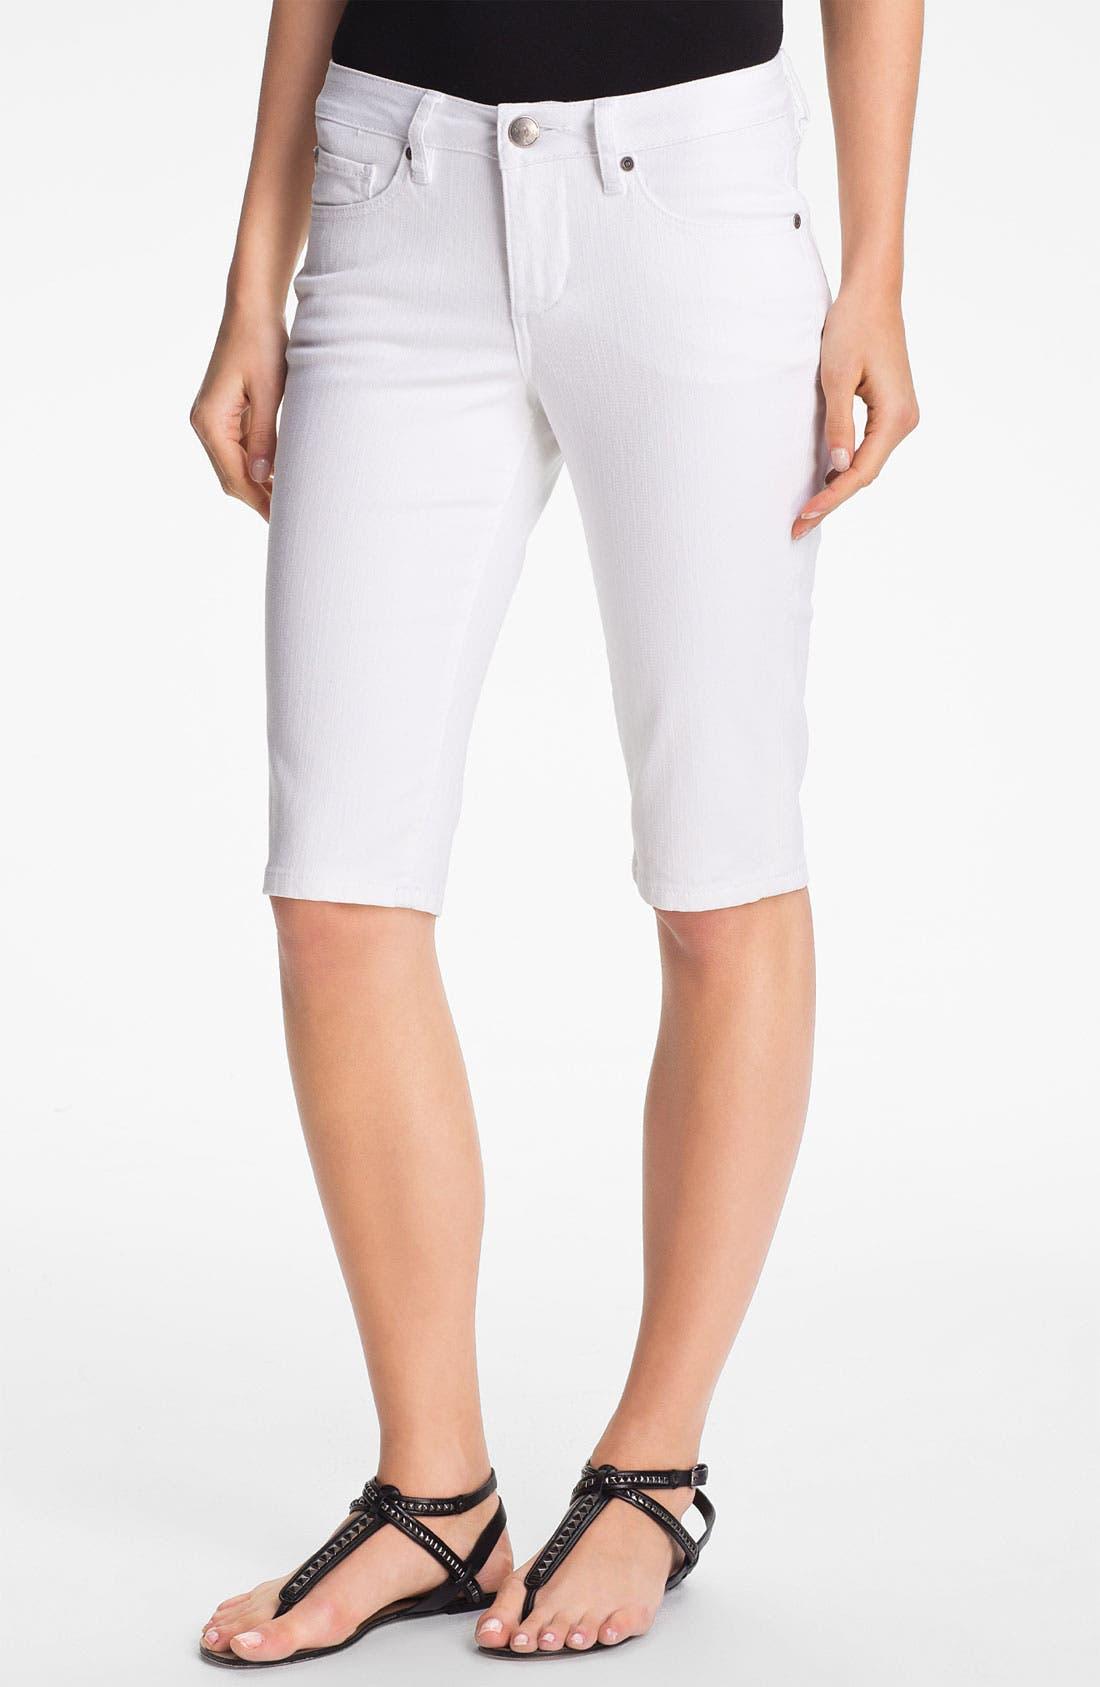 Alternate Image 1 Selected - Jag Jeans 'Robbie' Skinny Bermuda Shorts